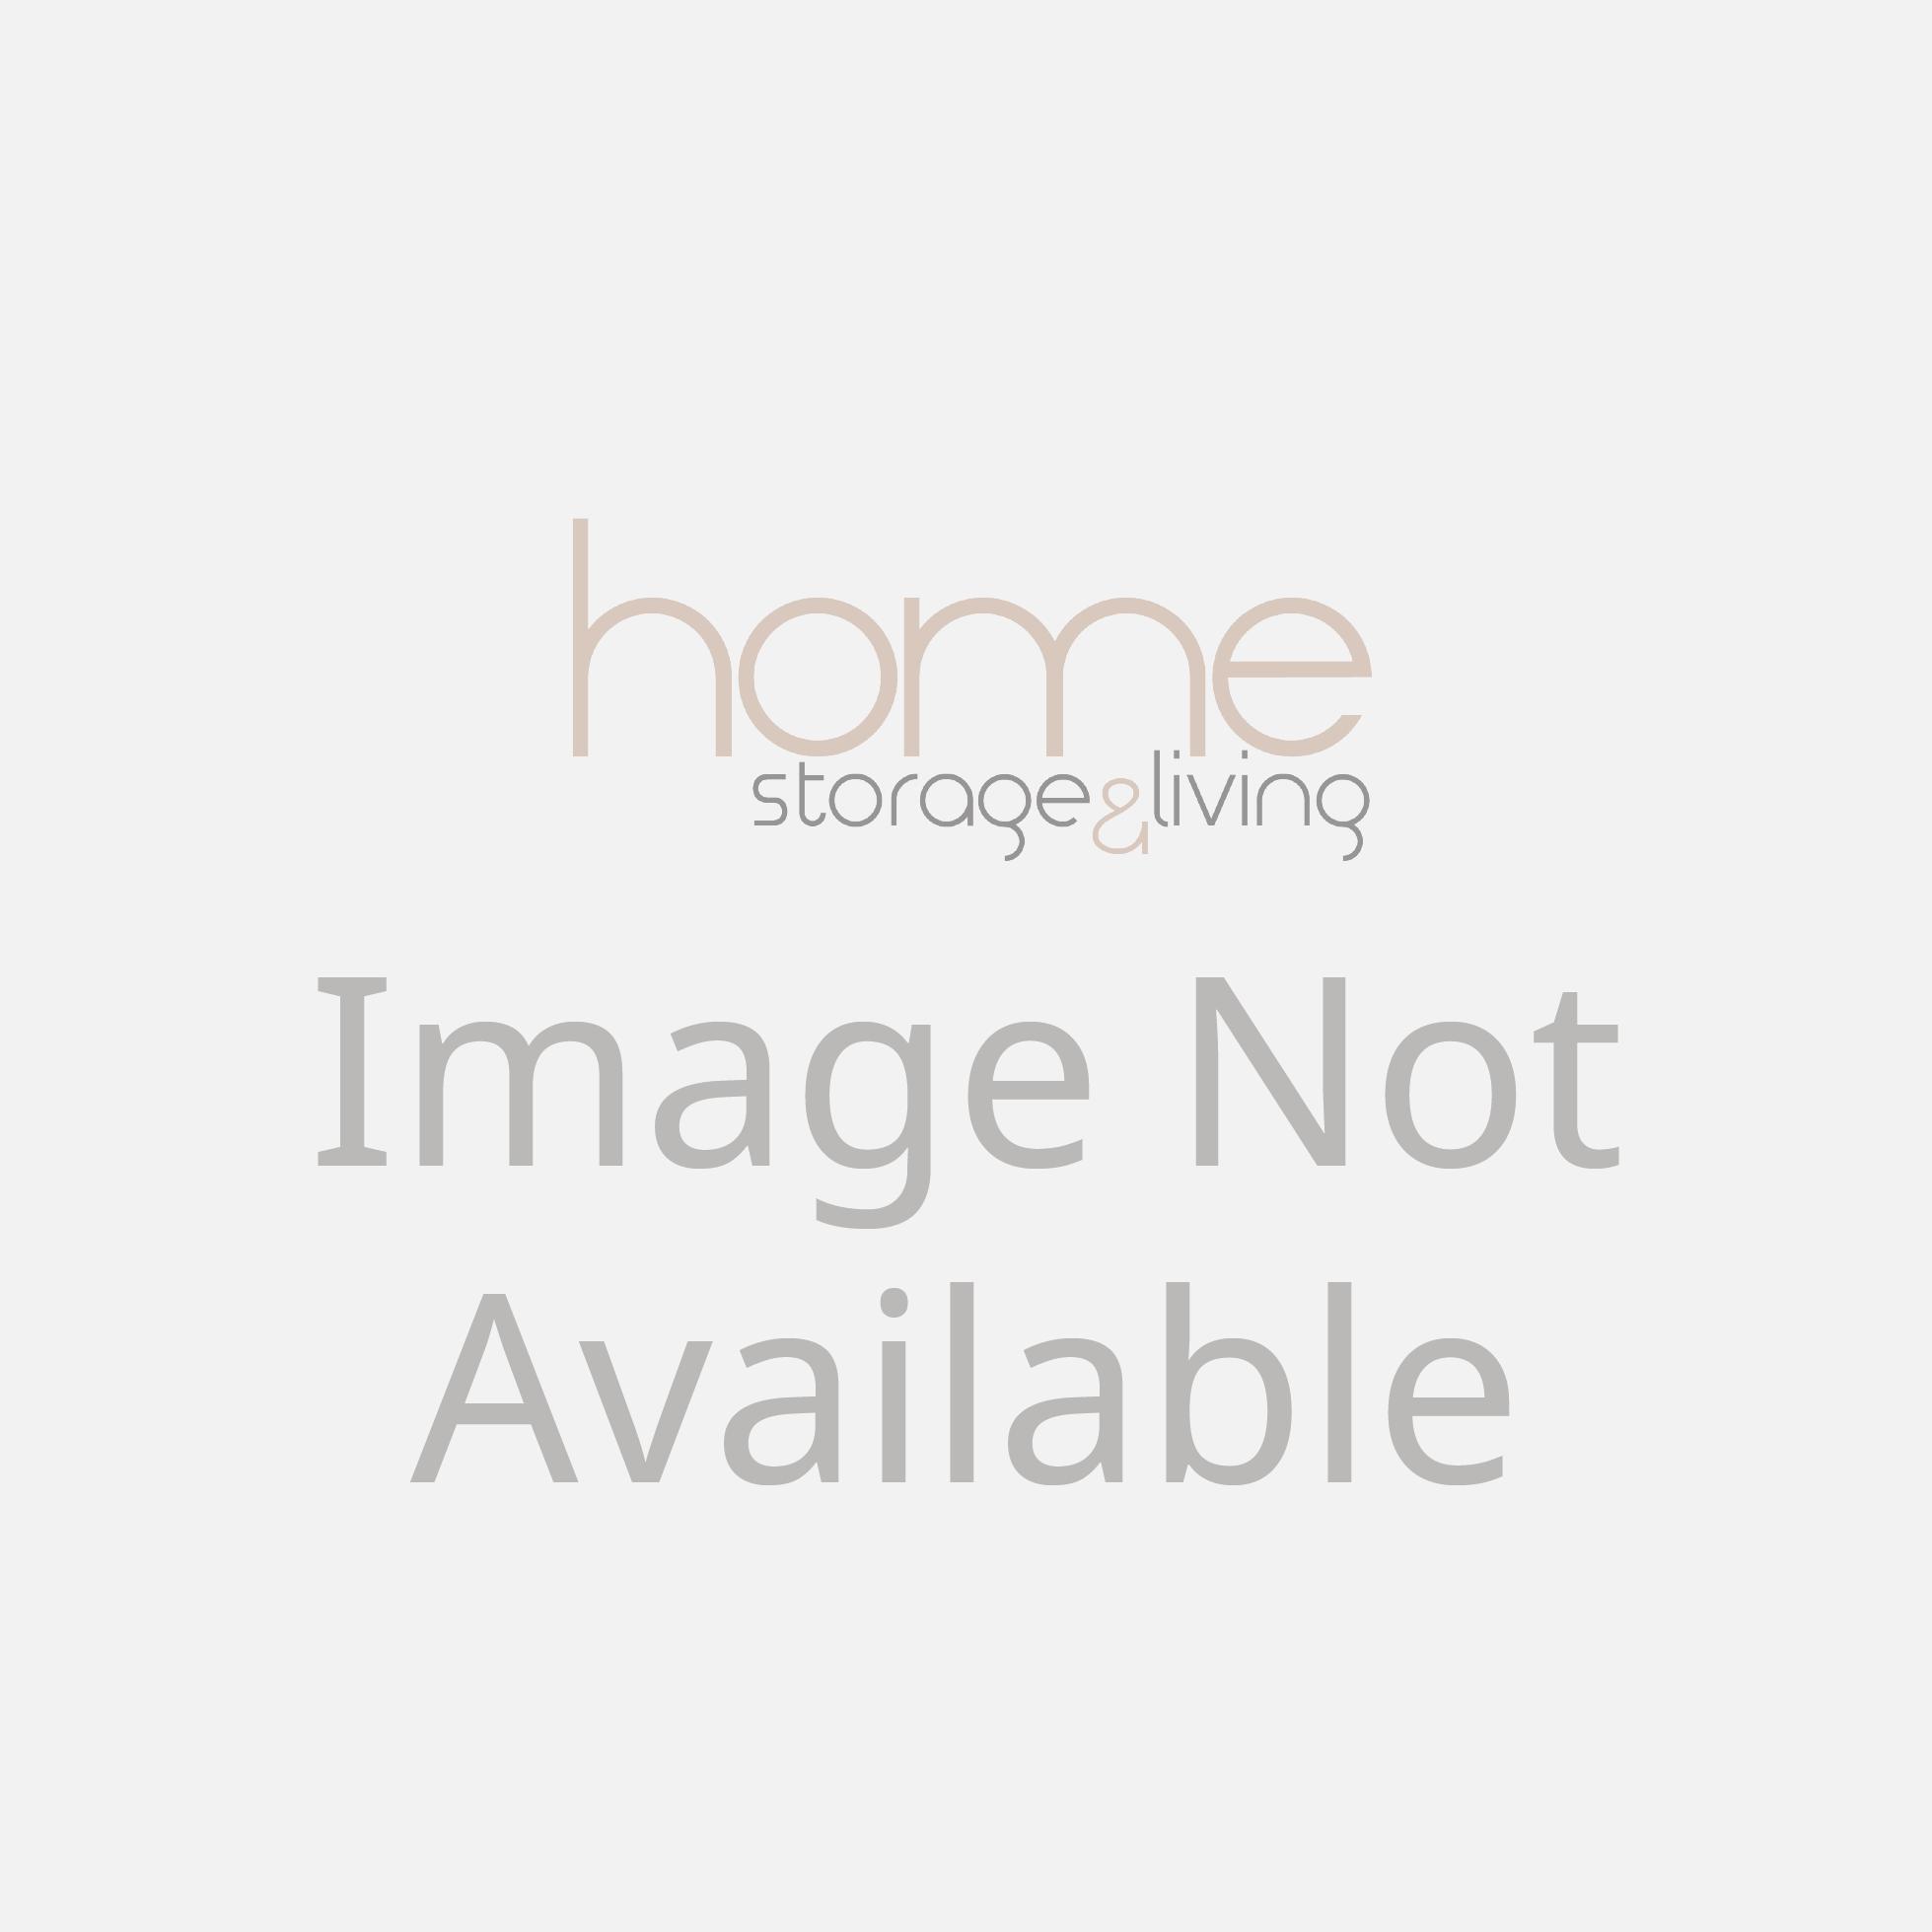 Mesh Storage Trolley with Wheels Black | Storage Baskets | Home Storage & Living